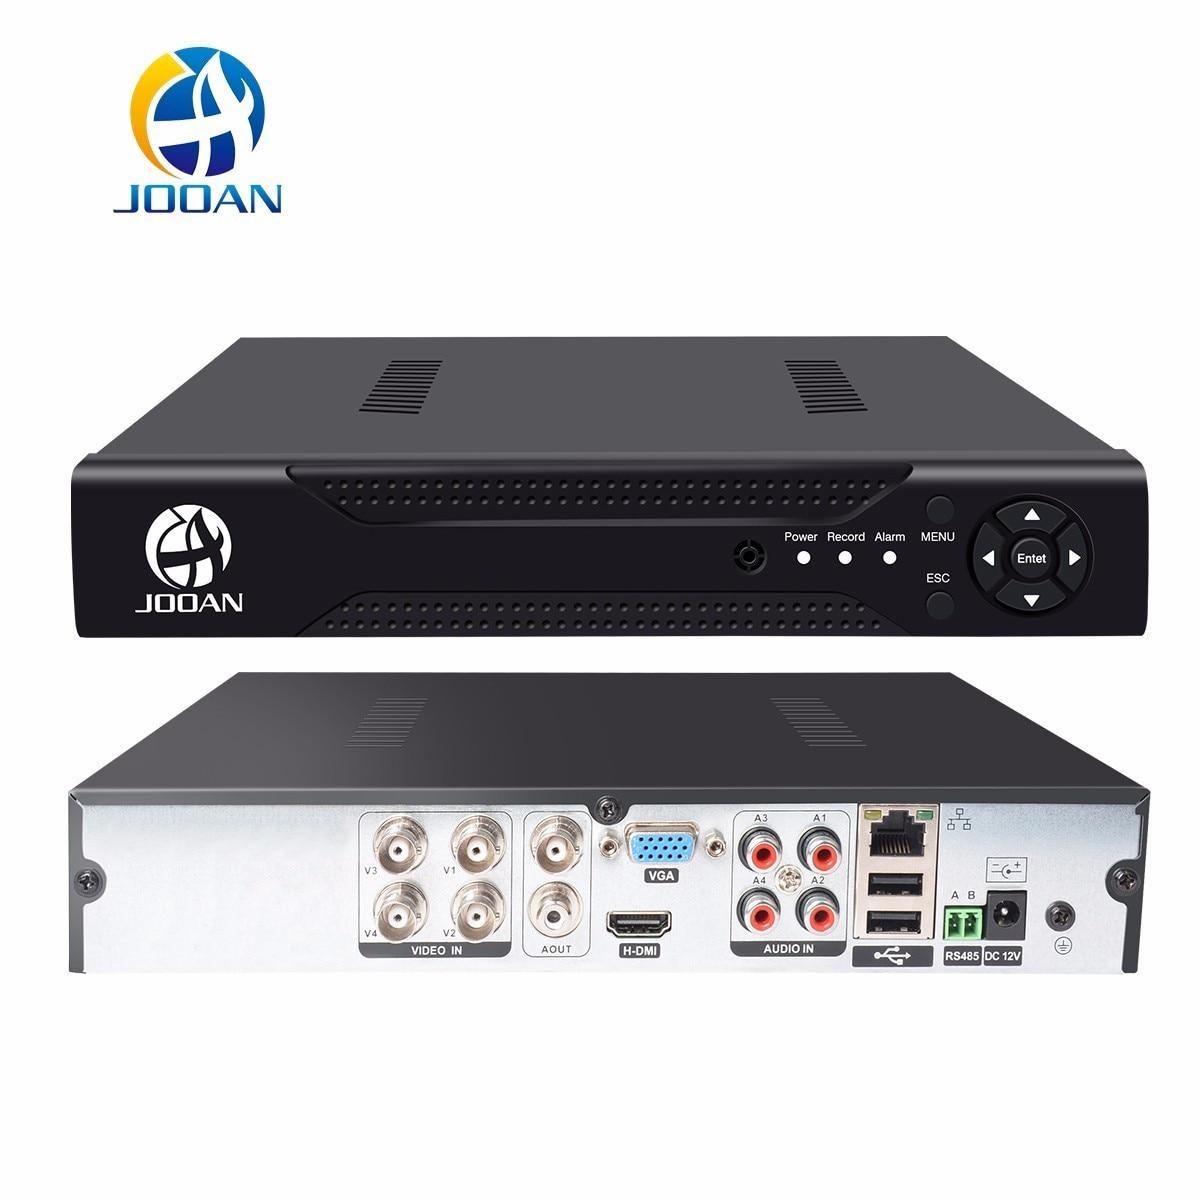 JOOAN 4CH CCTV DVR Security System 1080N H.264 HD-Output P2P Hybrid 5 in 1 Onvif IP Camera TVI CVI AHD Video Recorder